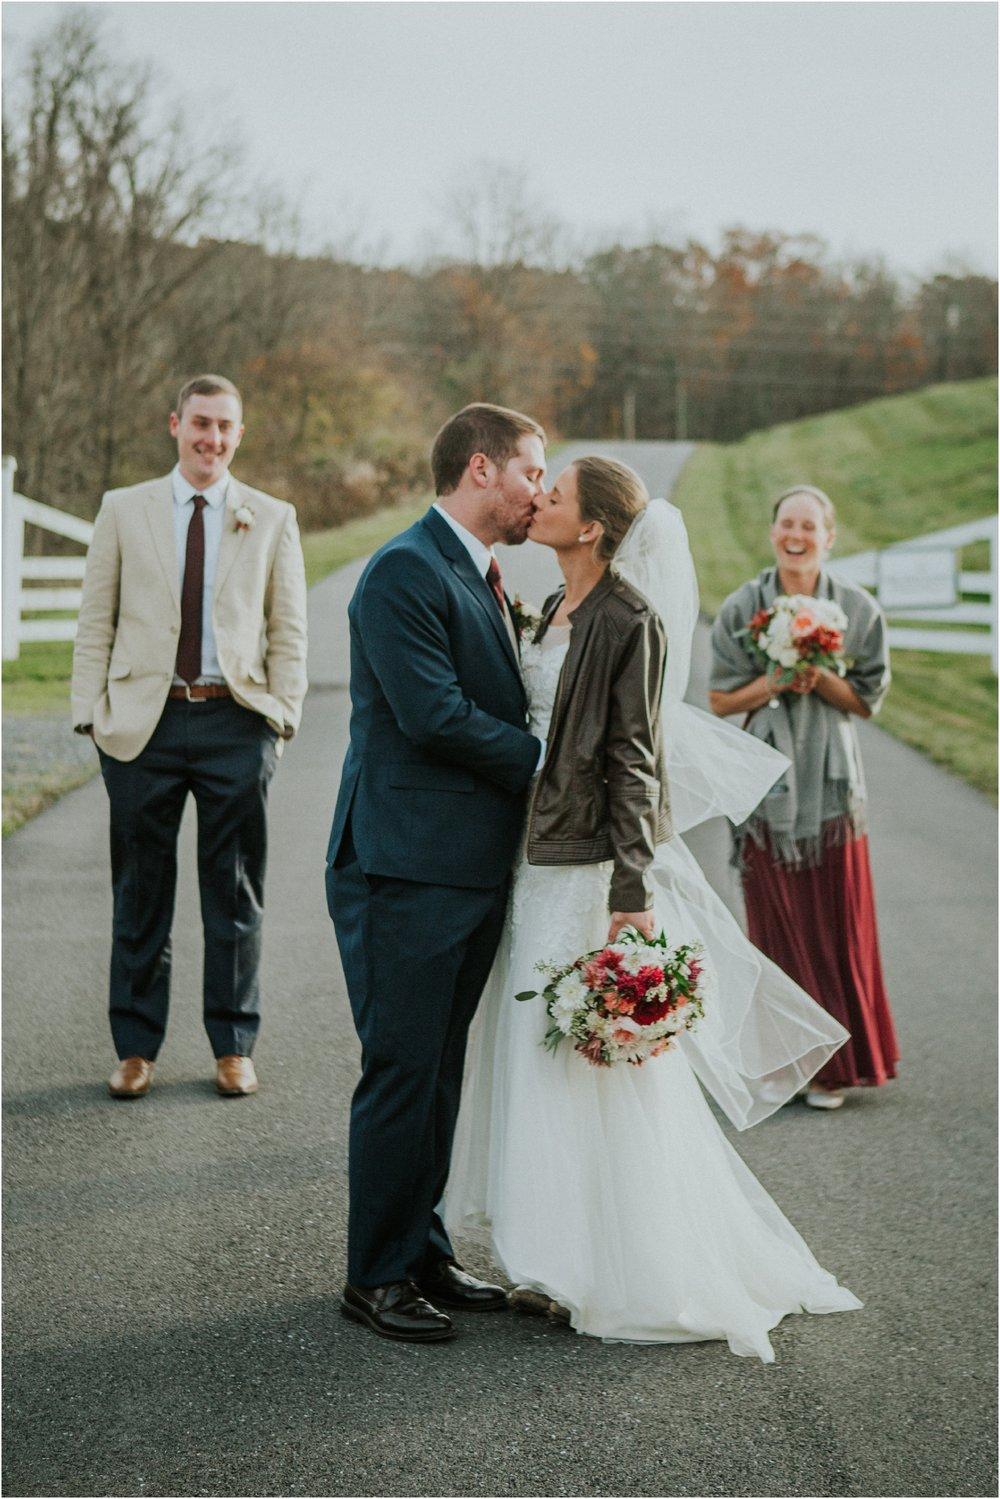 warm-springs-old-dairy-virginia-rustic-wedding-northeast-tennessee-elopement-adventuruous-photographer-katy-sergent_0068.jpg